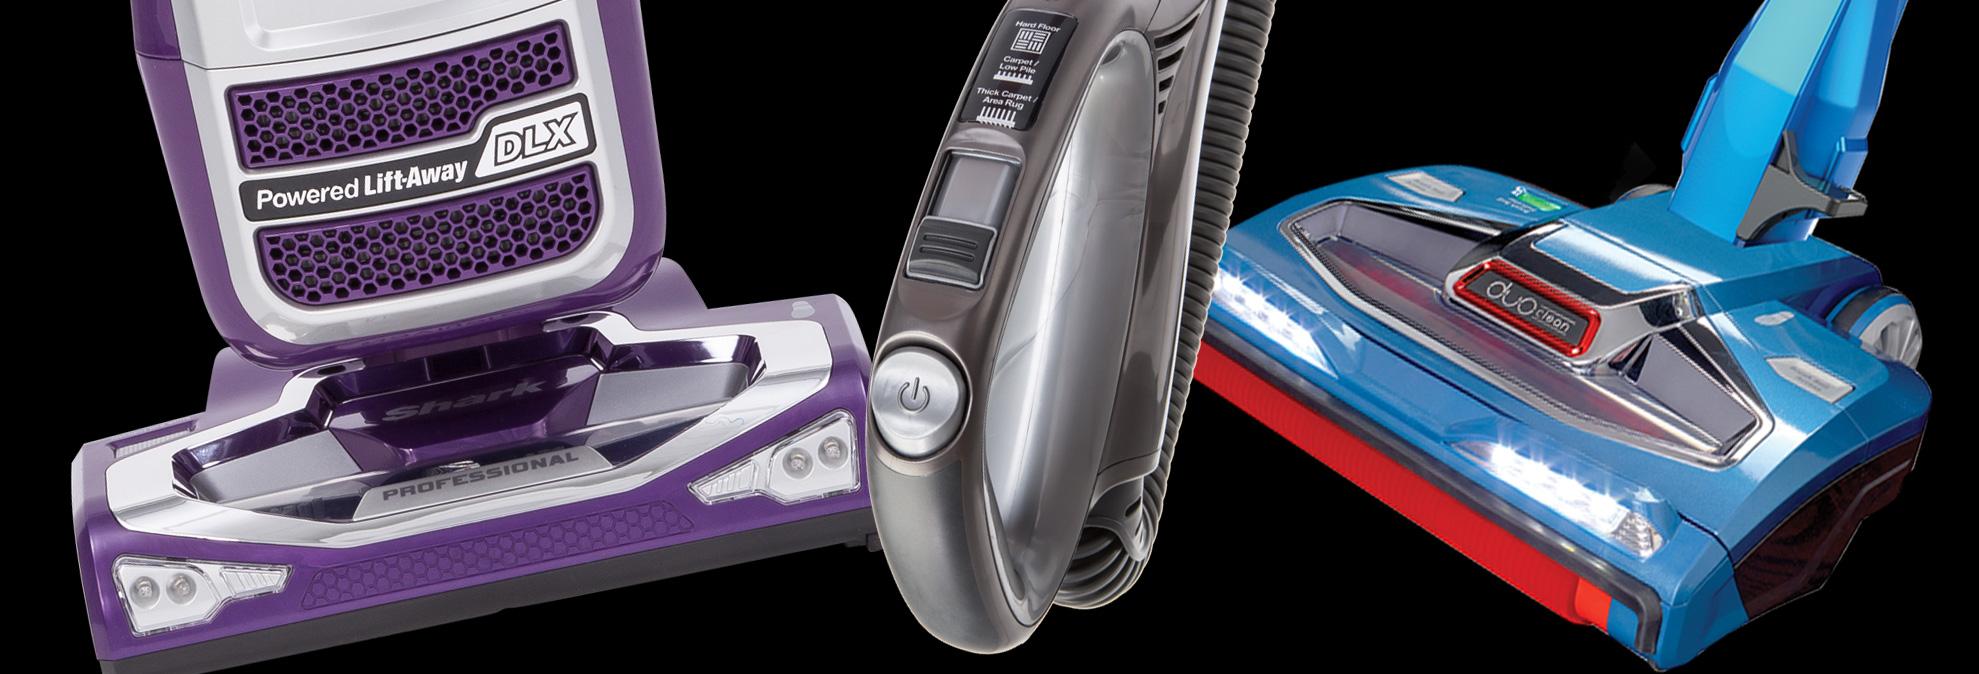 best shark vacuums consumer reports. Black Bedroom Furniture Sets. Home Design Ideas